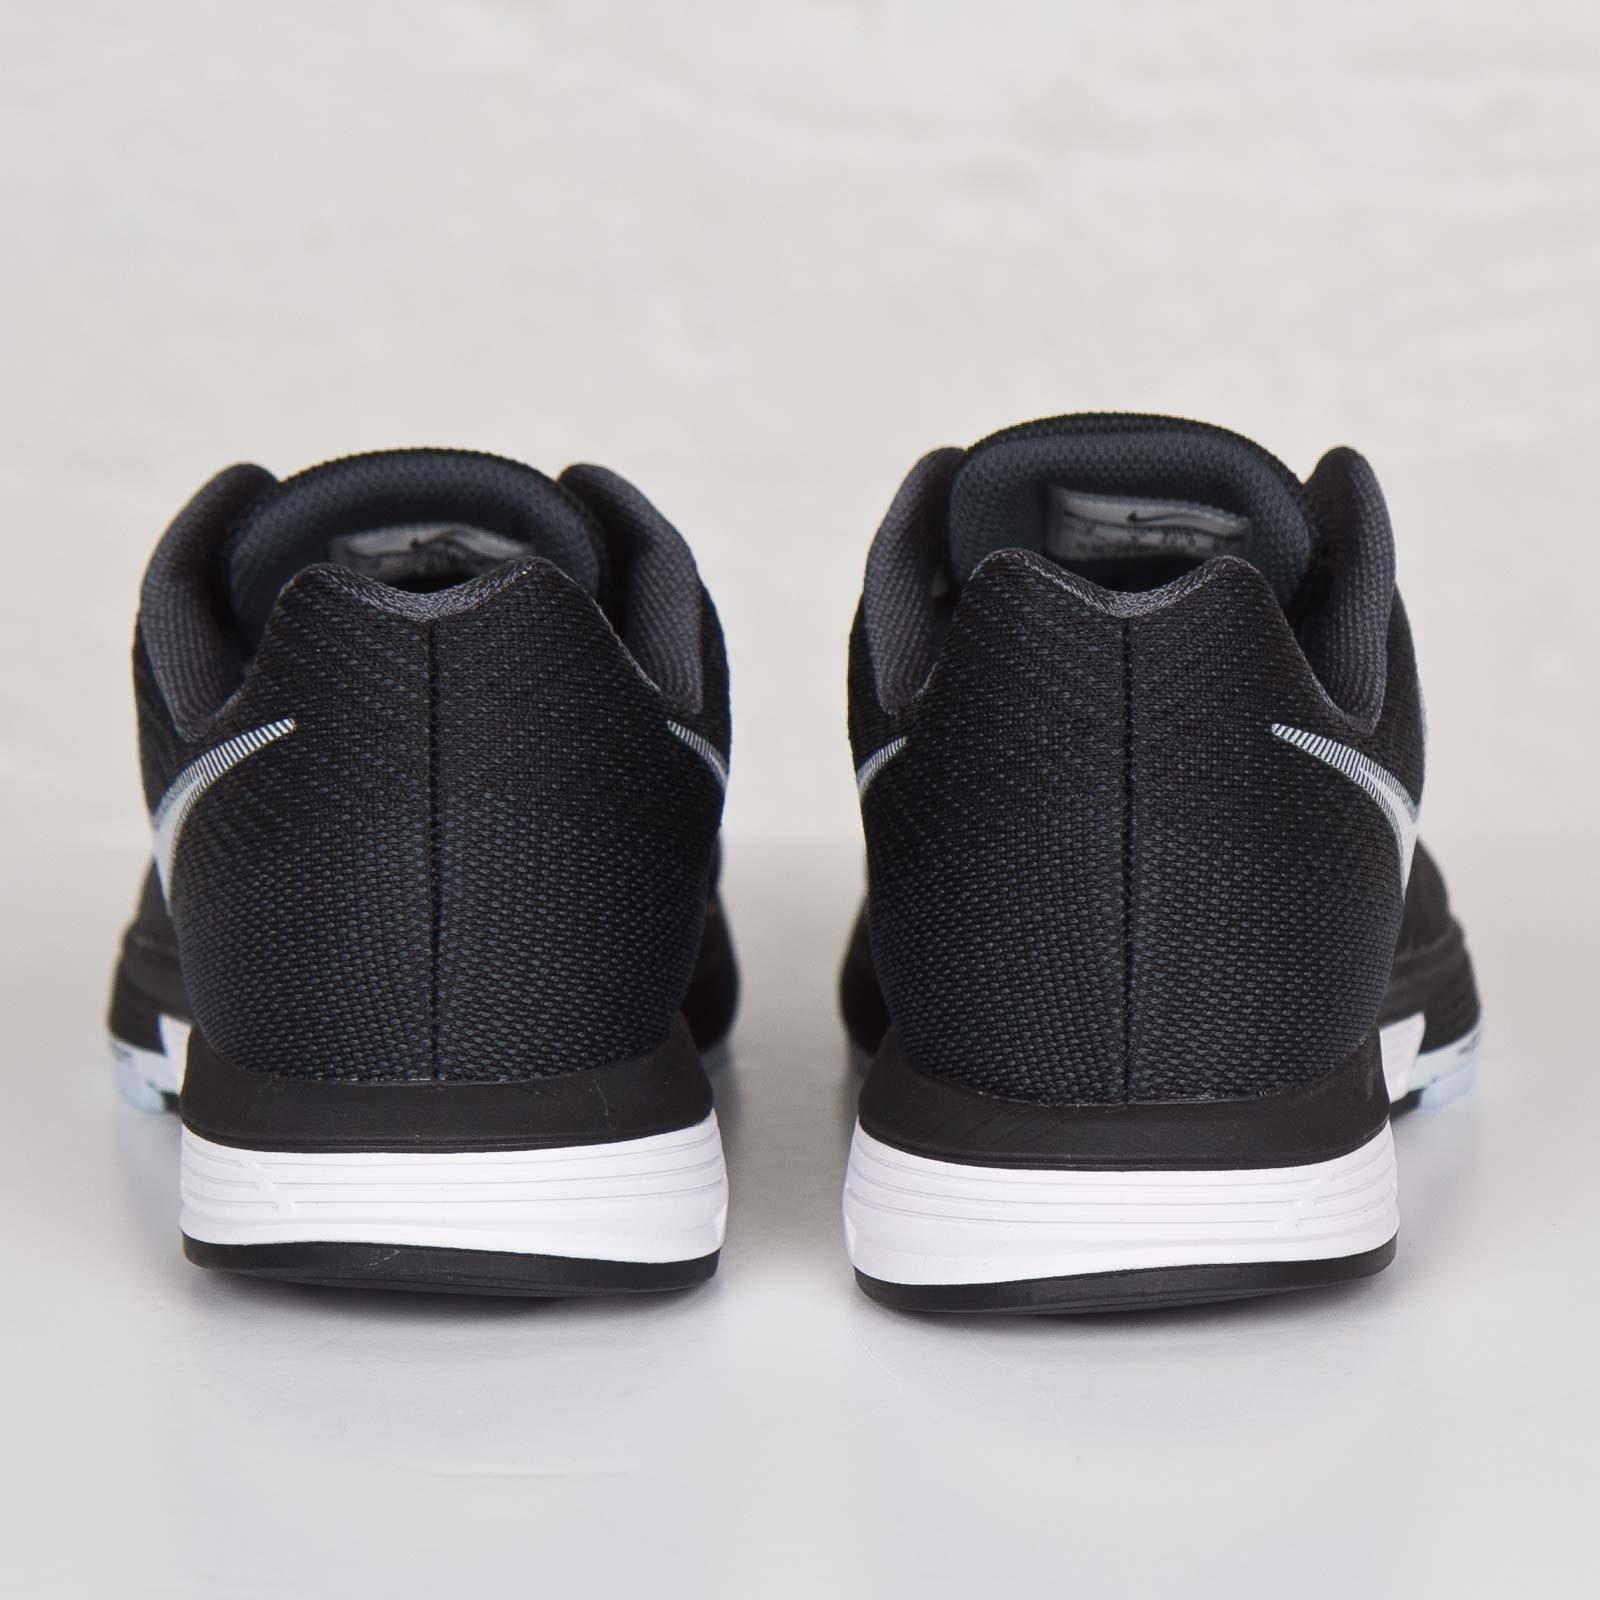 purchase cheap b3b8f 417f2 Nike Air Zoom Vomero 10 - 717440-002 - Sneakersnstuff   sneakers    streetwear online since 1999